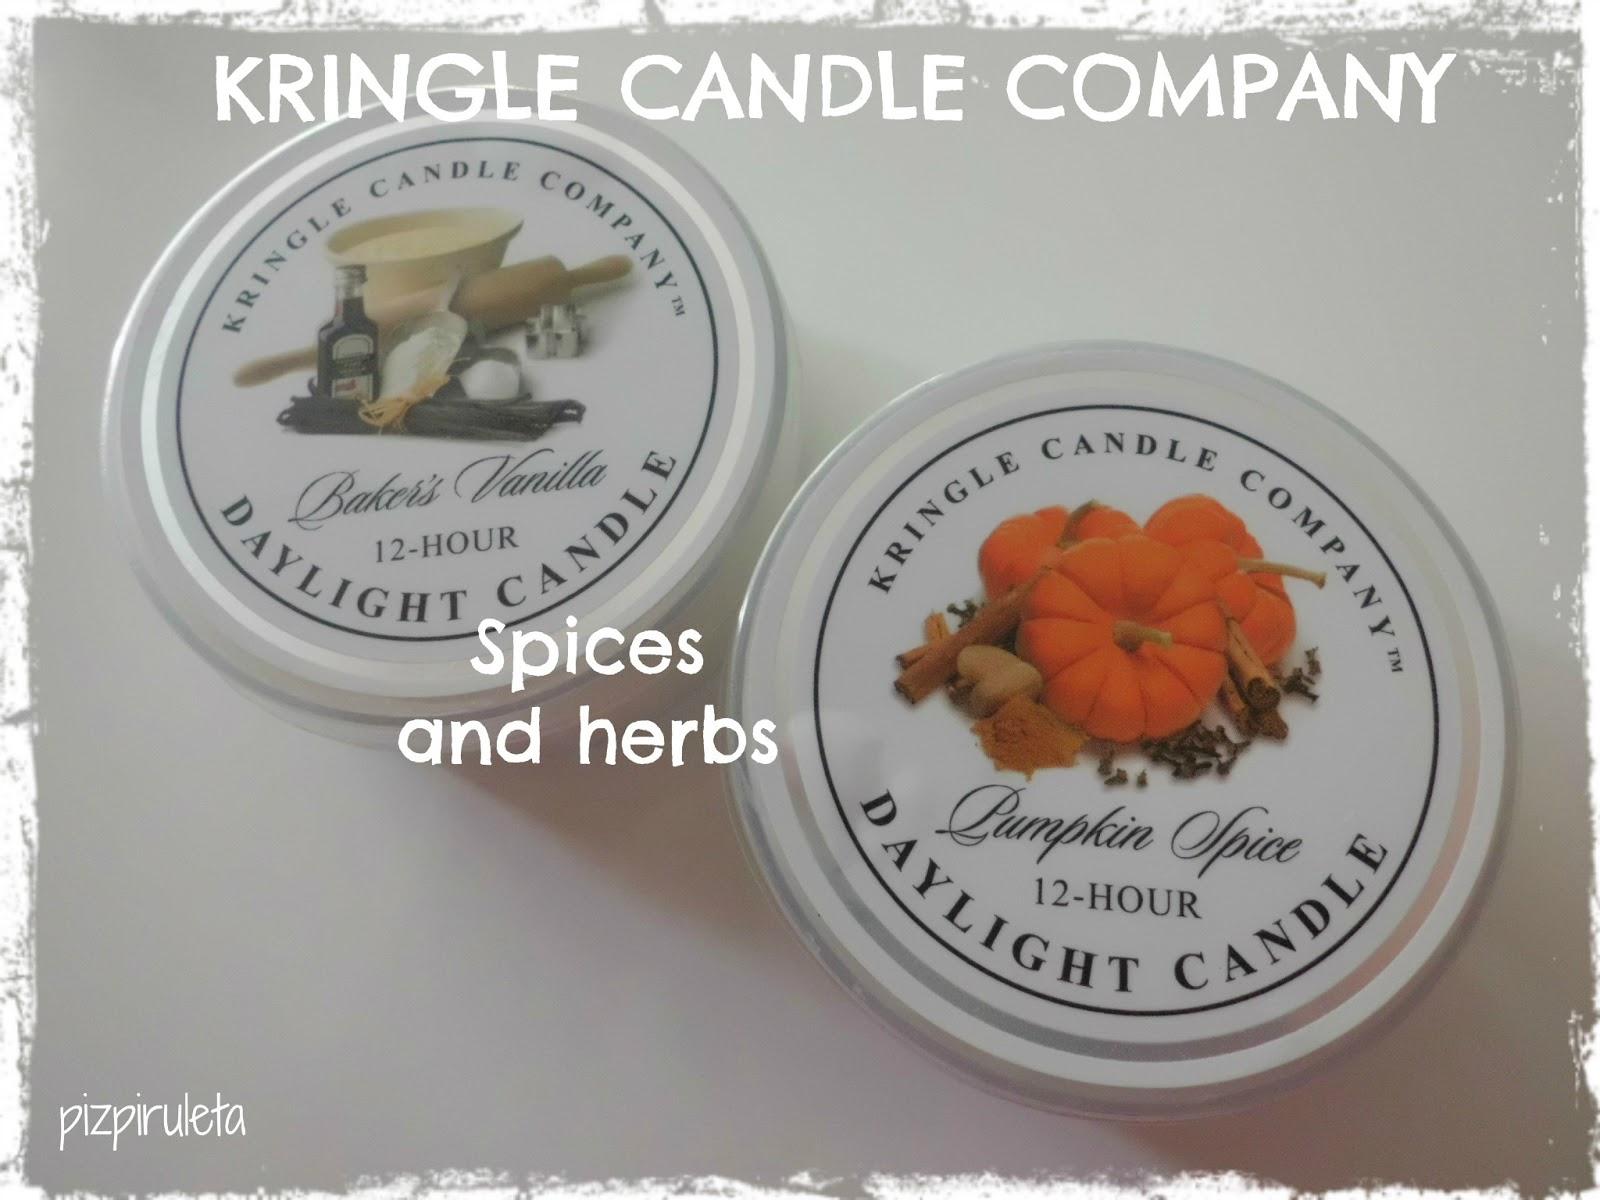 Pizpiruleteando Kringle Candle Company 161 M 225 S Velas